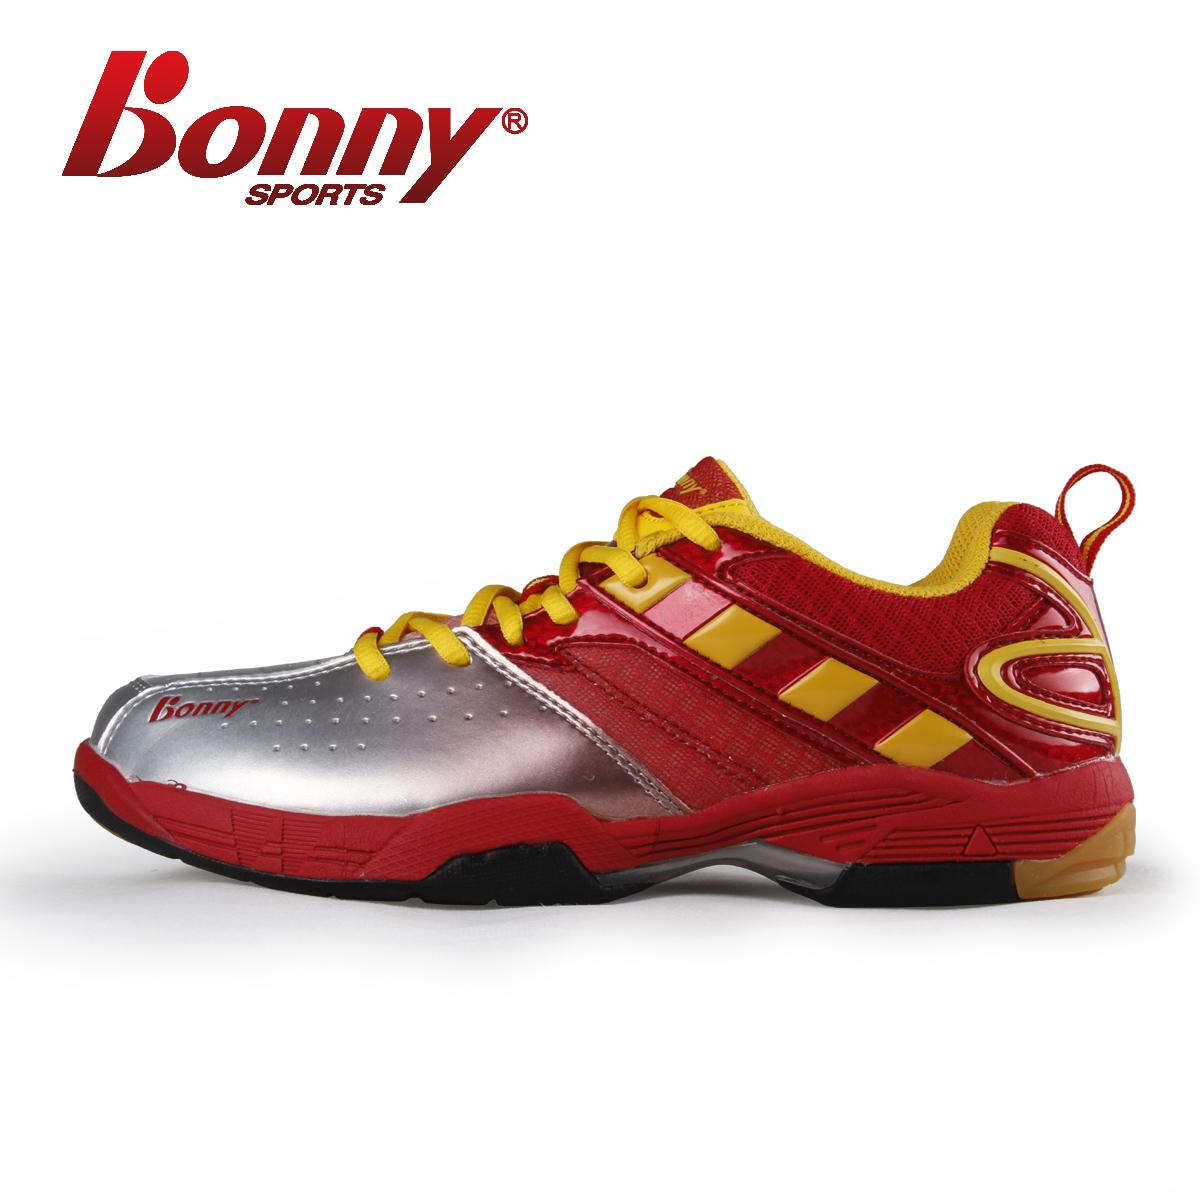 Bonny波力夏正品减震超轻羽毛球鞋女鞋男鞋儿童薄底启动快红色608